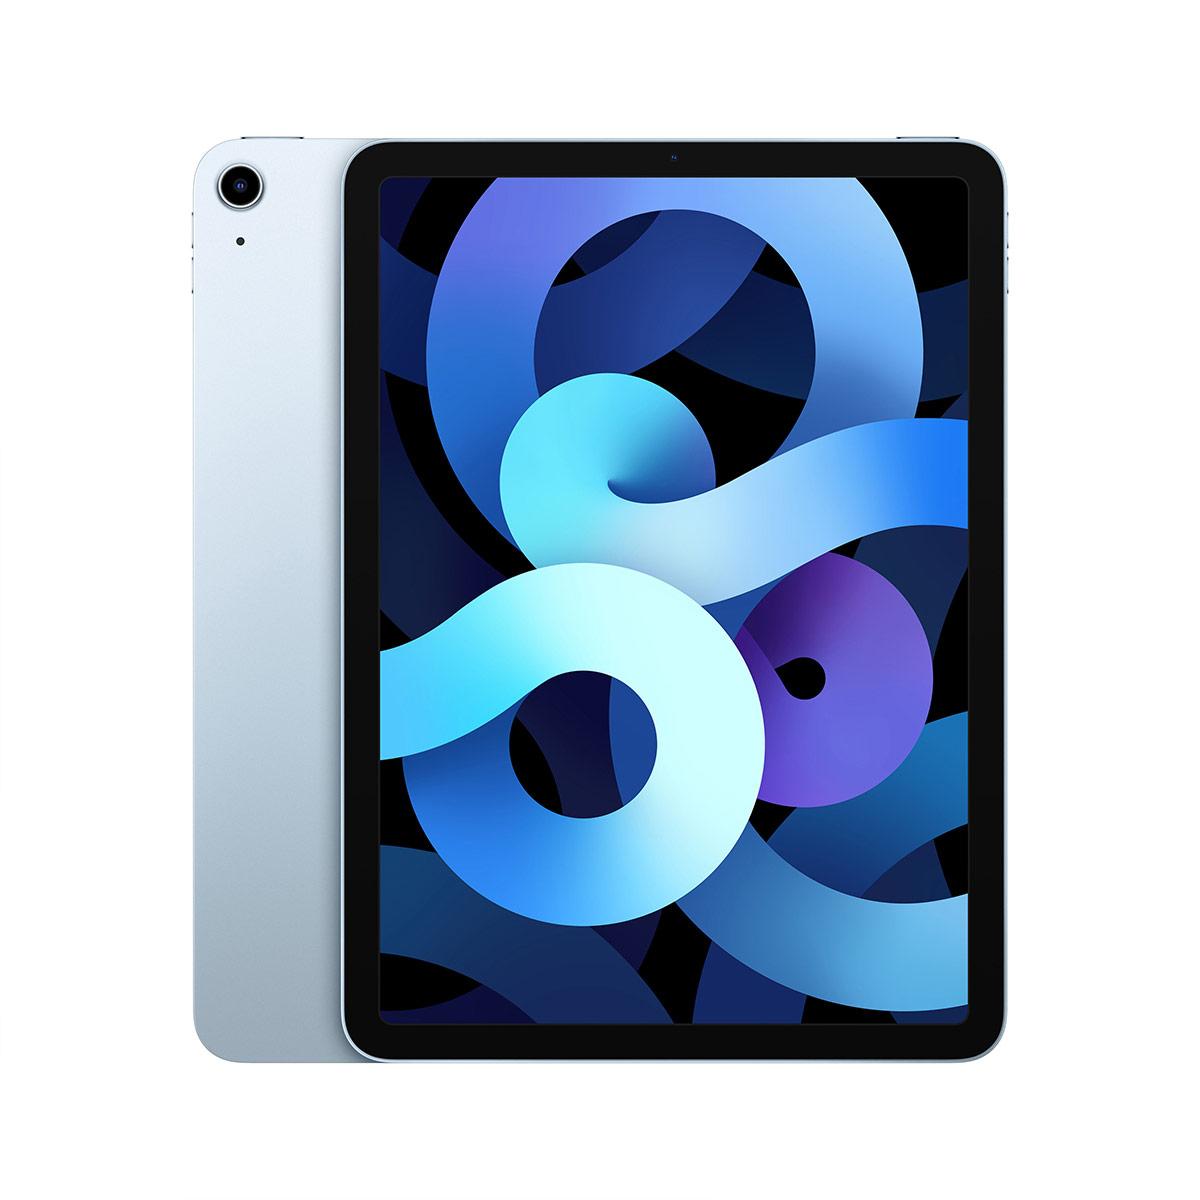 "Apple iPad Air 10.9"" 256GB WiFi - Sky Blue"